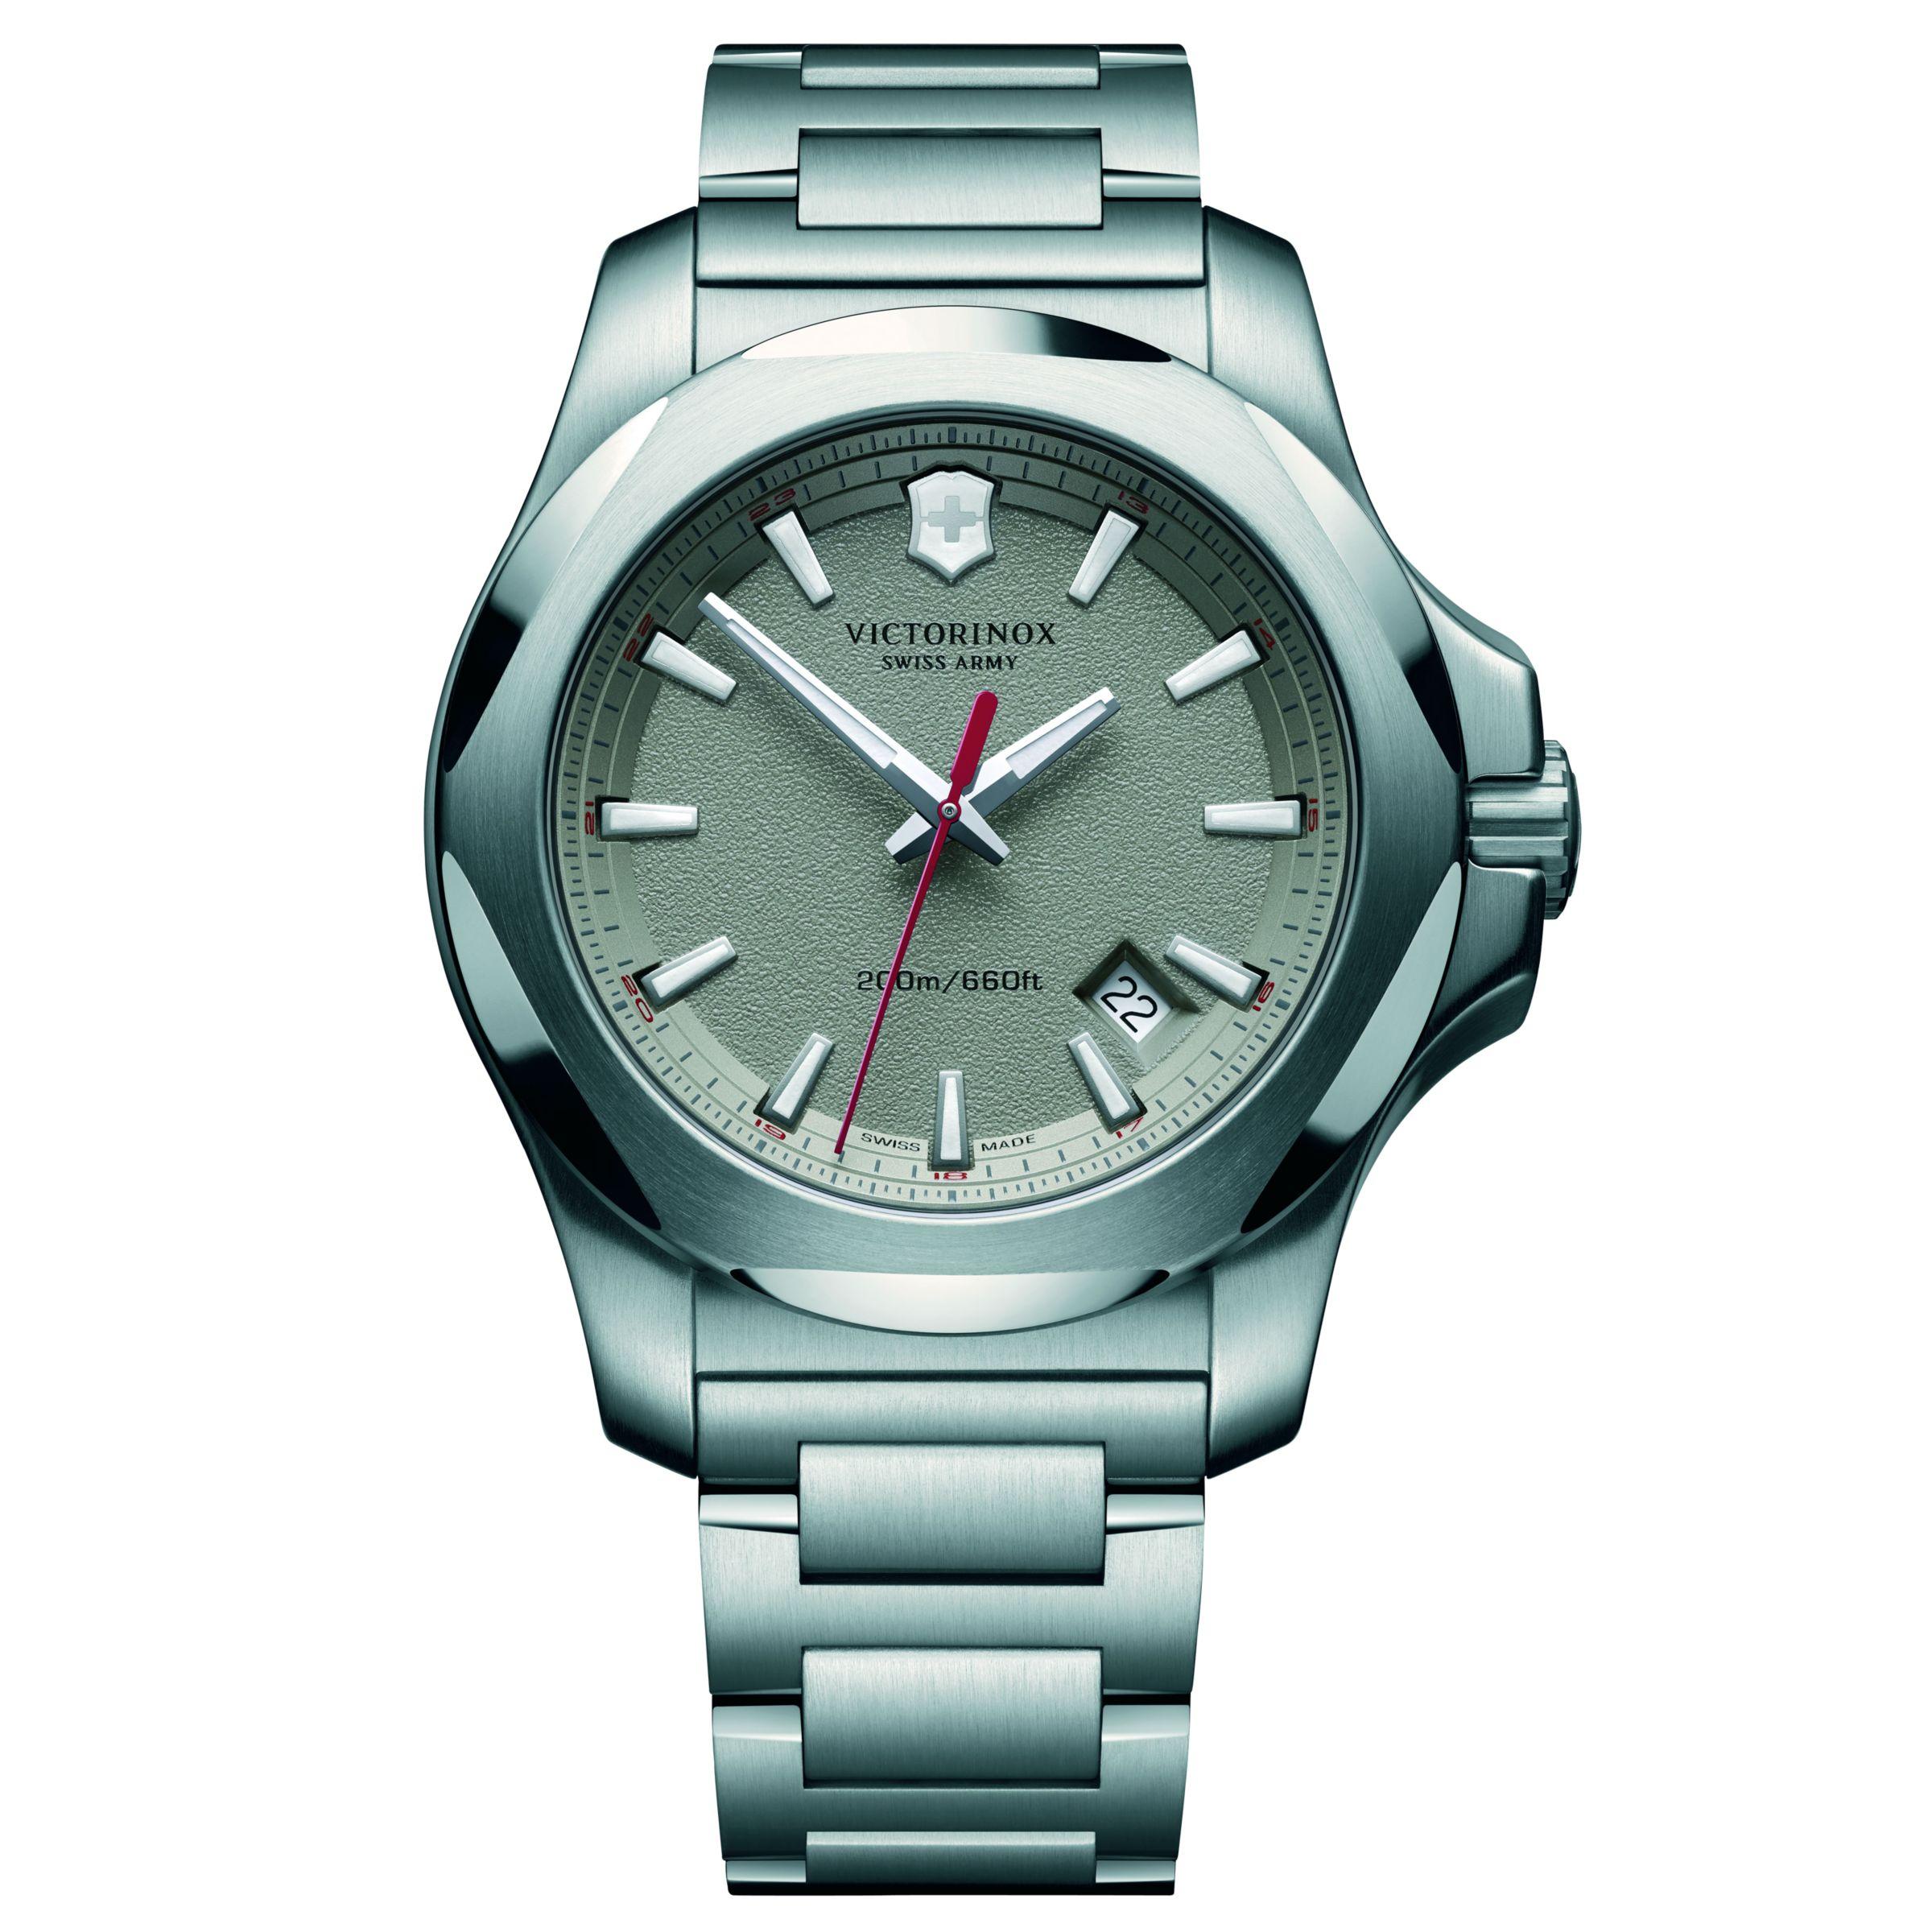 Victorinox Victorinox 241739 Men's I.N.O.X Date Bracelet Strap Watch, Silver